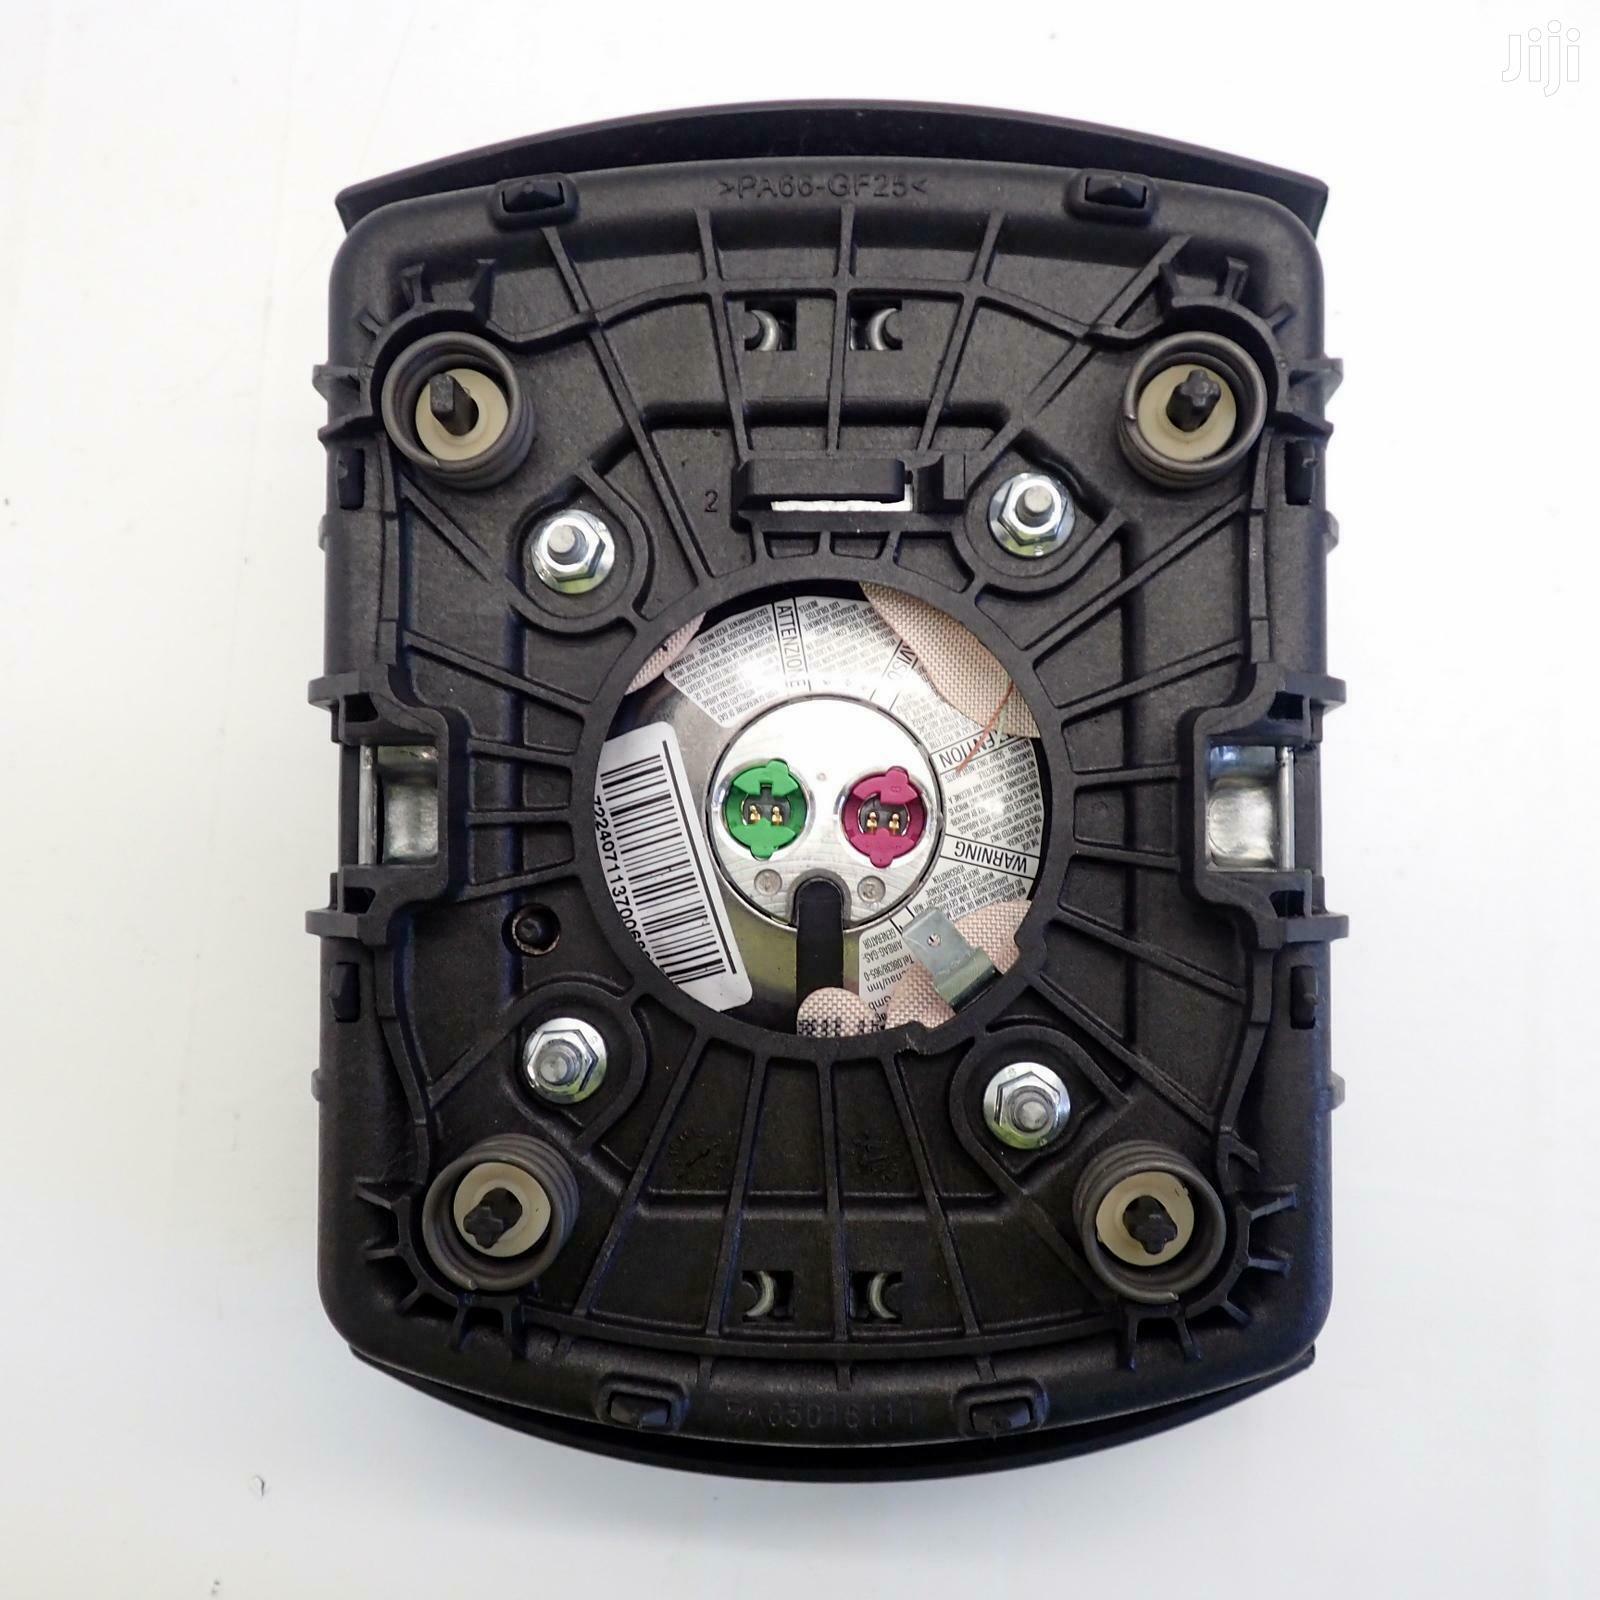 Steering Wheel Airbag Land Rover Discovery 3 2.7 TDV6 | Vehicle Parts & Accessories for sale in Ngara, Nairobi, Kenya